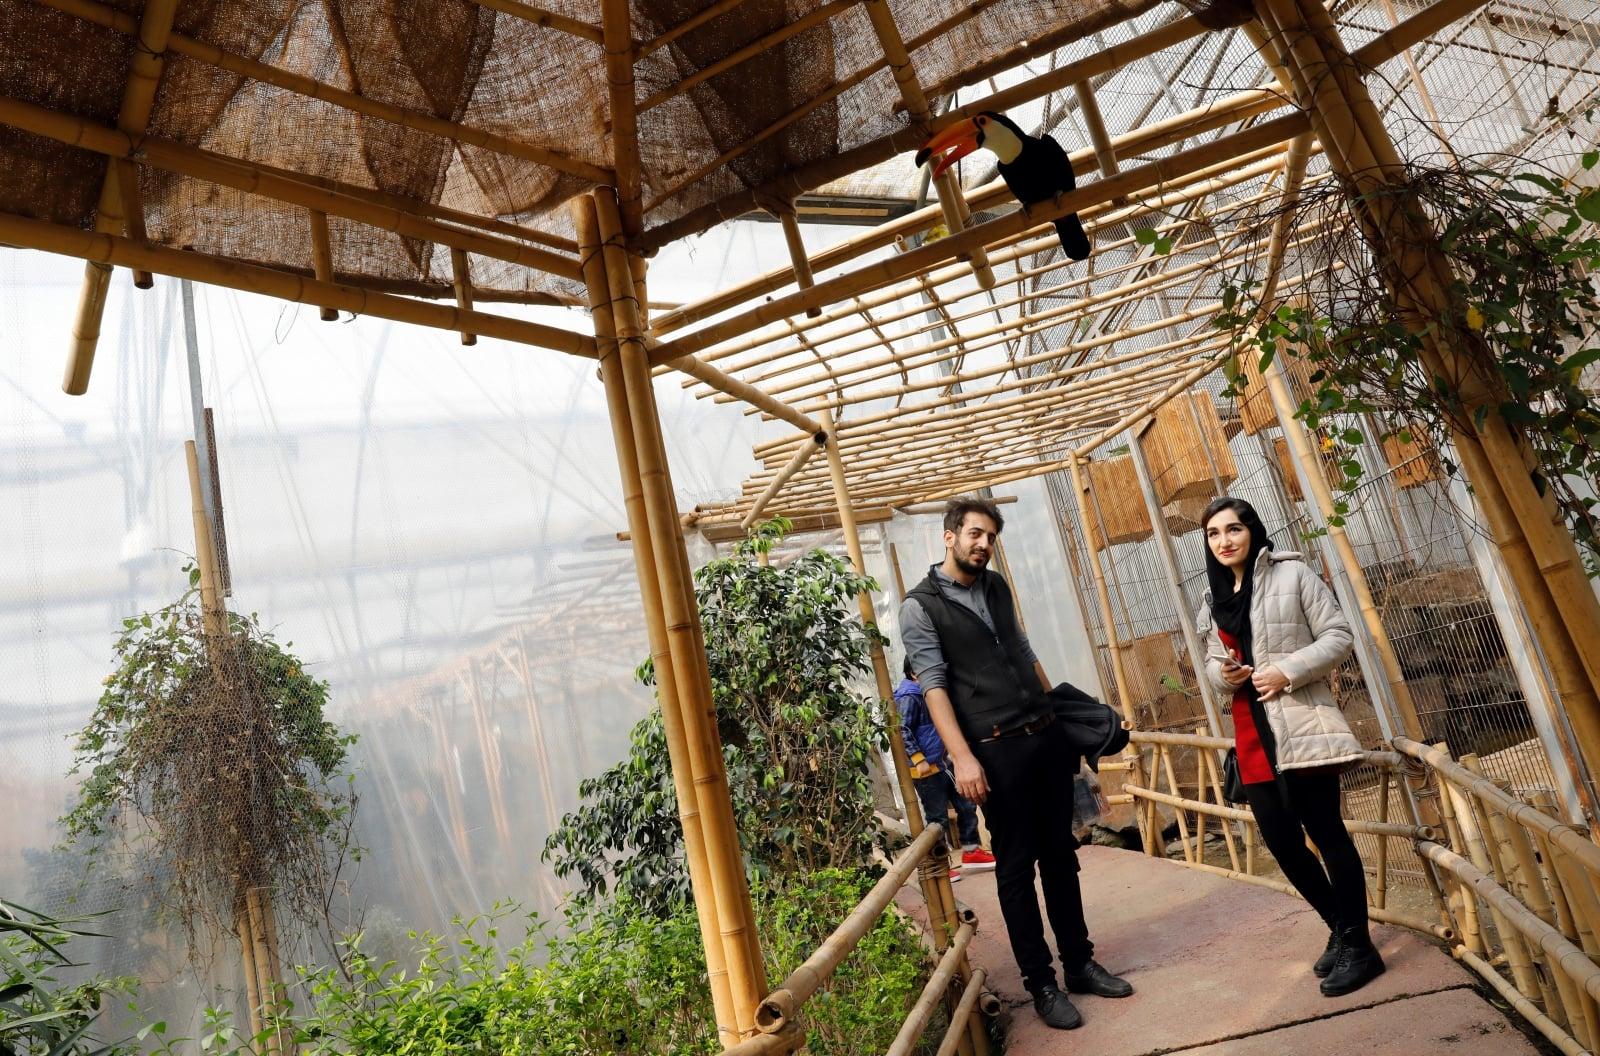 Ogród Ptaków w Iranie, fot. EPA/ABEDIN TAHERKENAREH